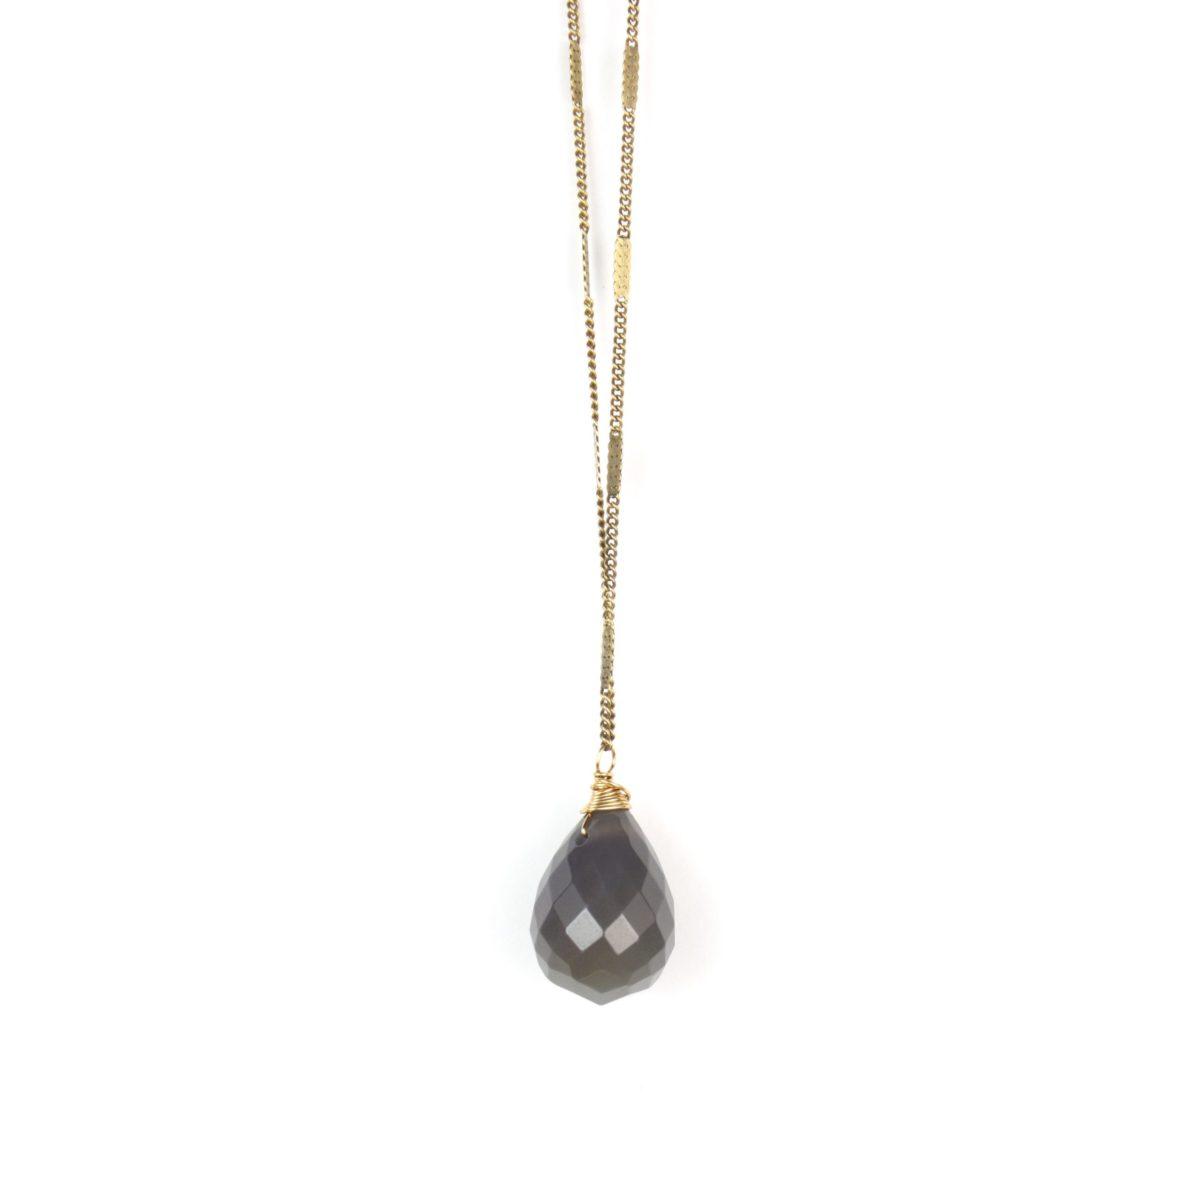 drop-necklace-grey-agate